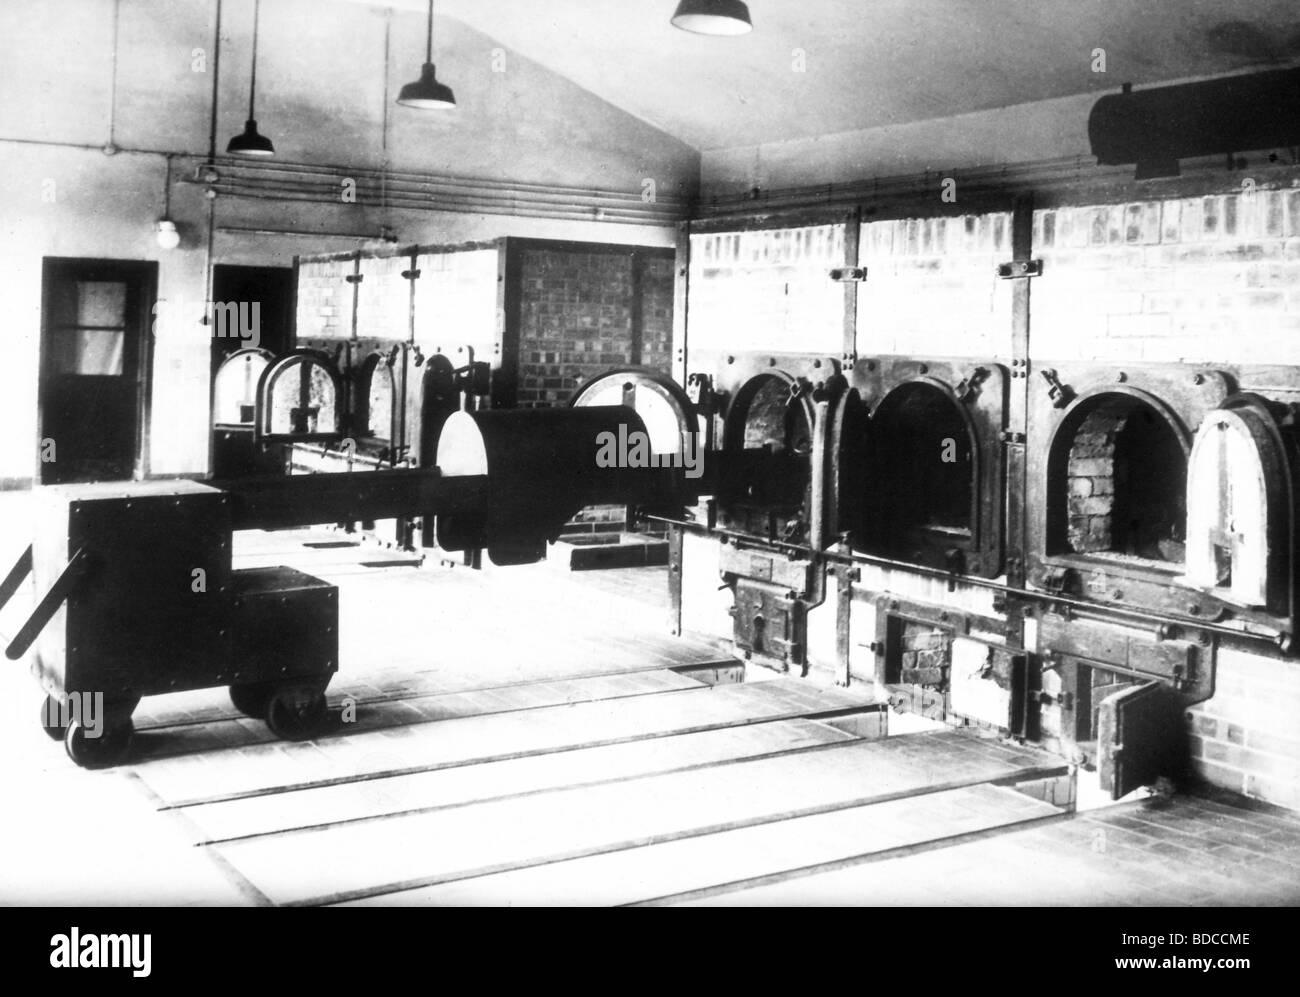 events, National Socialism, crimes, Auschwitz-Birkenau  Concentration Camp, crematory, interior view, ovens, Auschwitz, - Stock Image